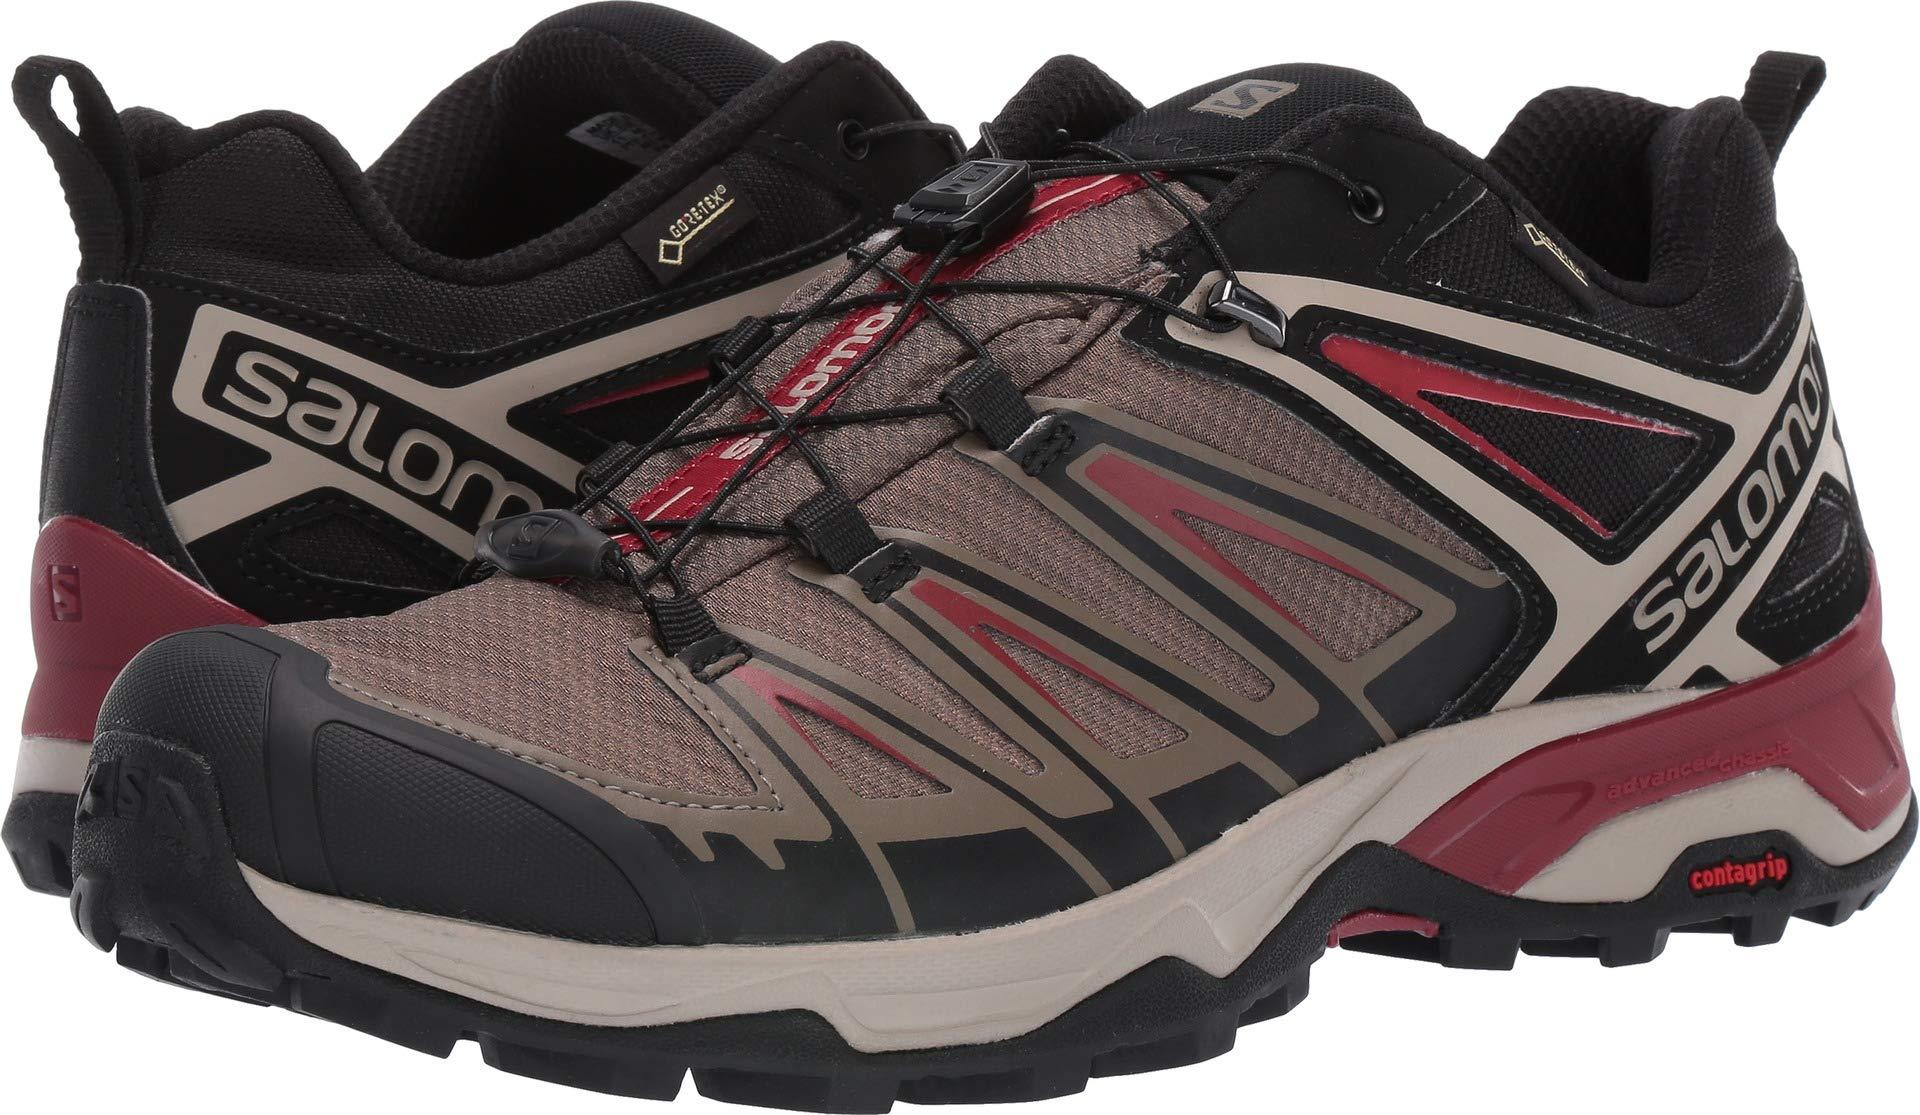 Salomon X Ultra 3 GTX Hiking Boots - Mens, Bungee Cord/Vintage Kaki/Red Dahlia, L40674900-9